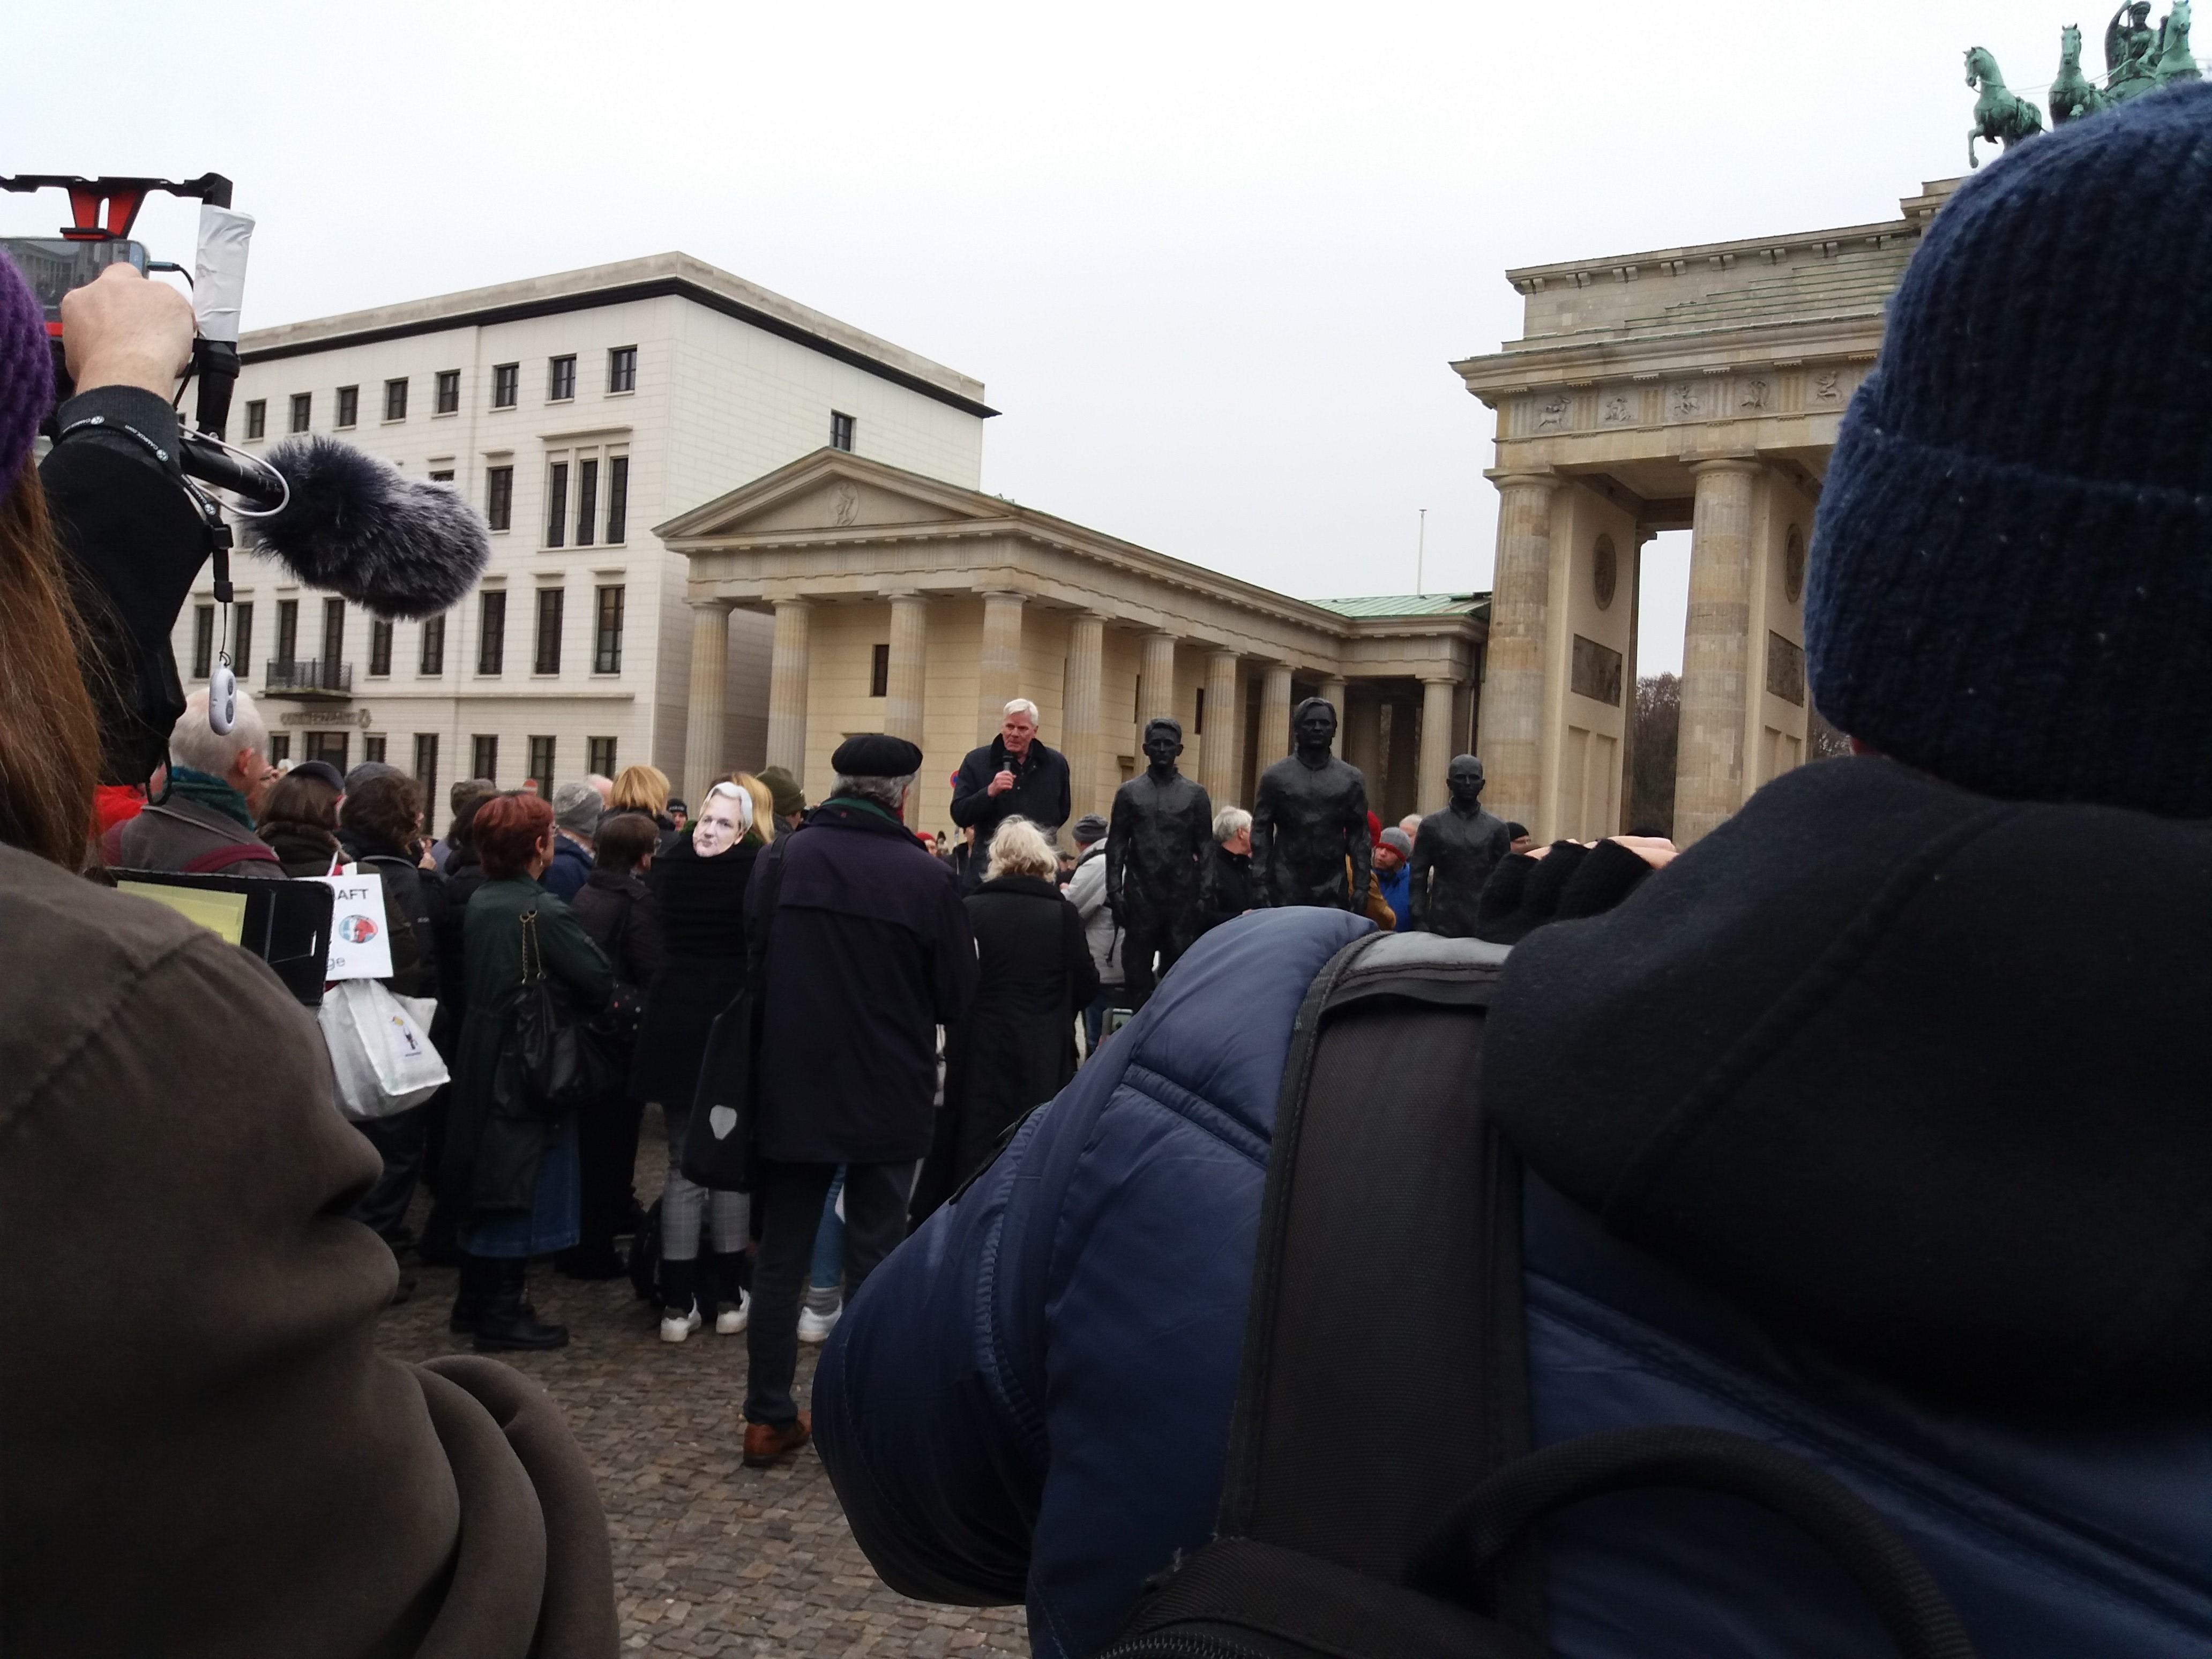 Berlin 27.11.2019